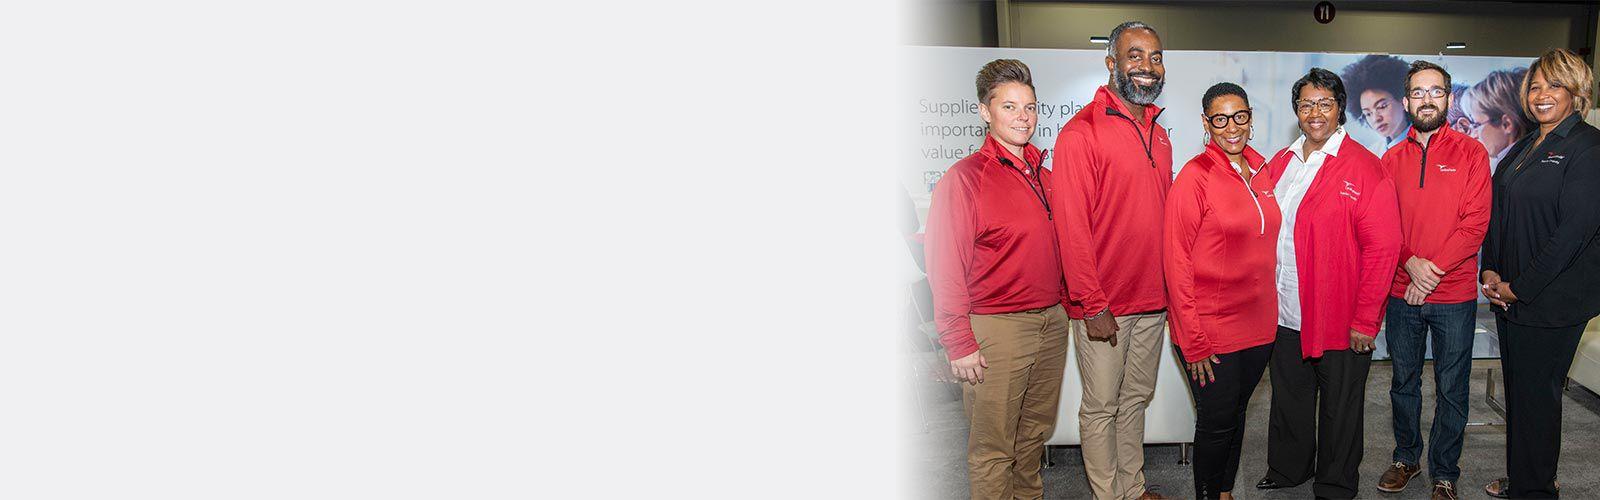 Cardinal Health Supplier Diversity team.